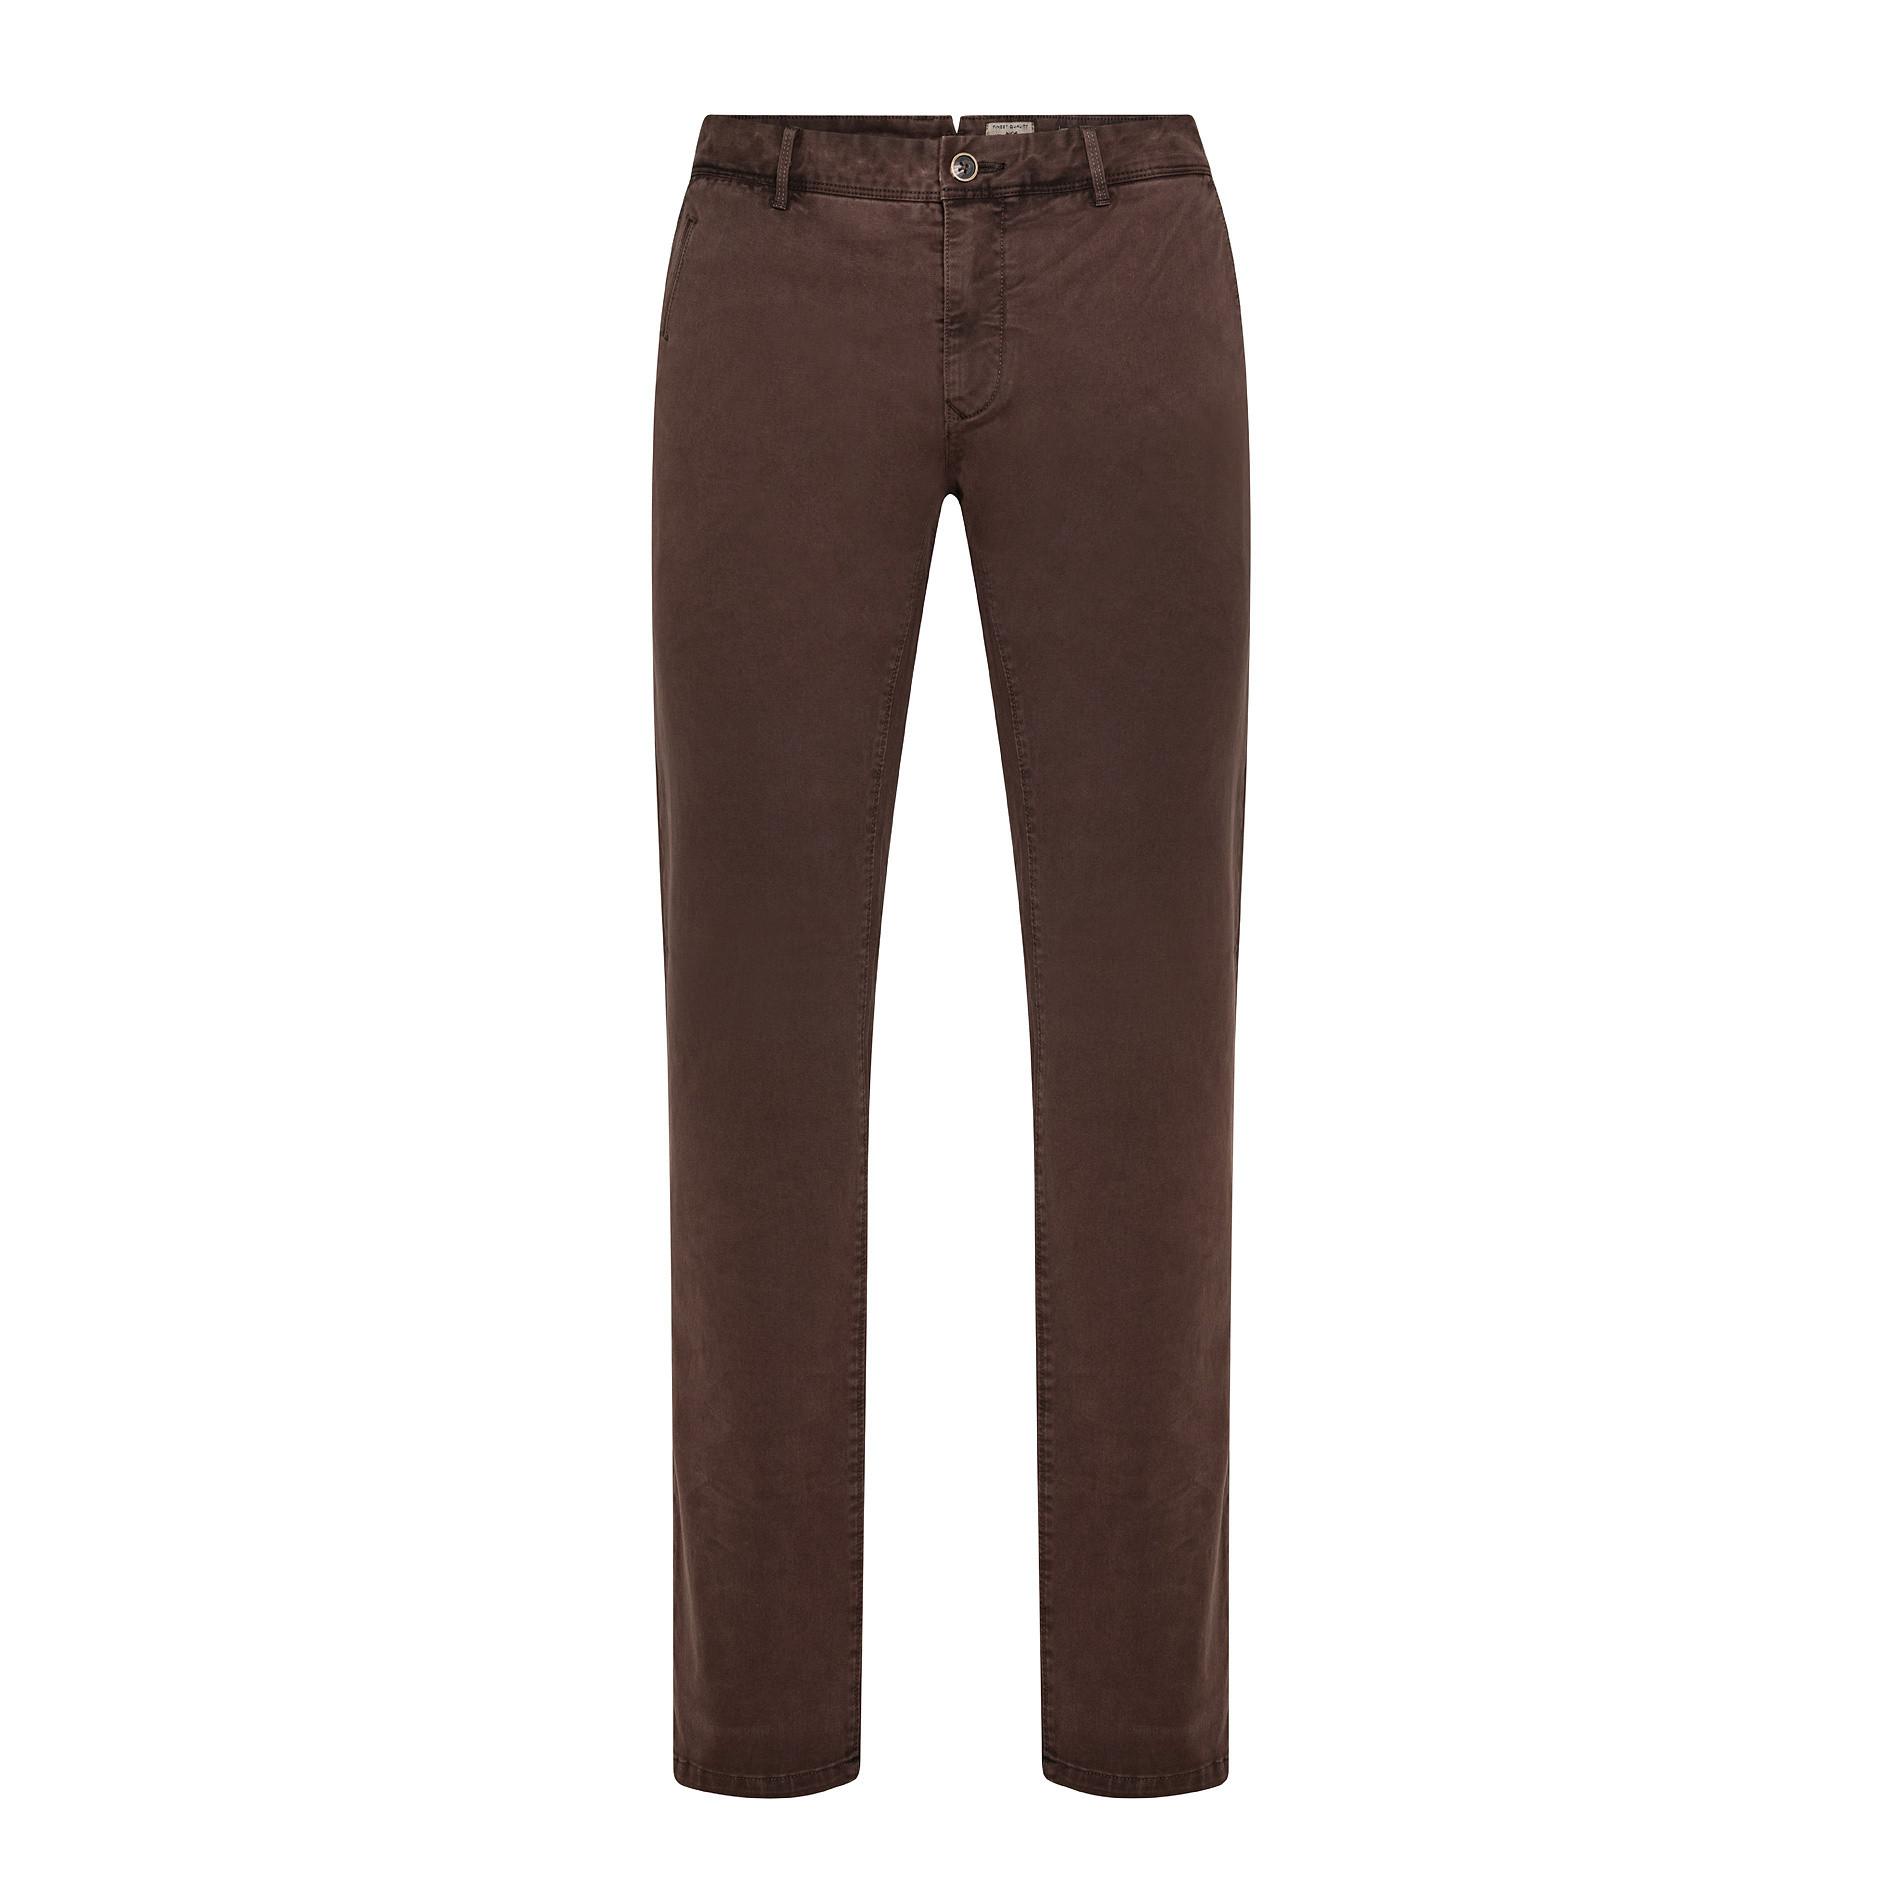 Pantaloni chino in tessuto stretch, Marrone, large image number 0